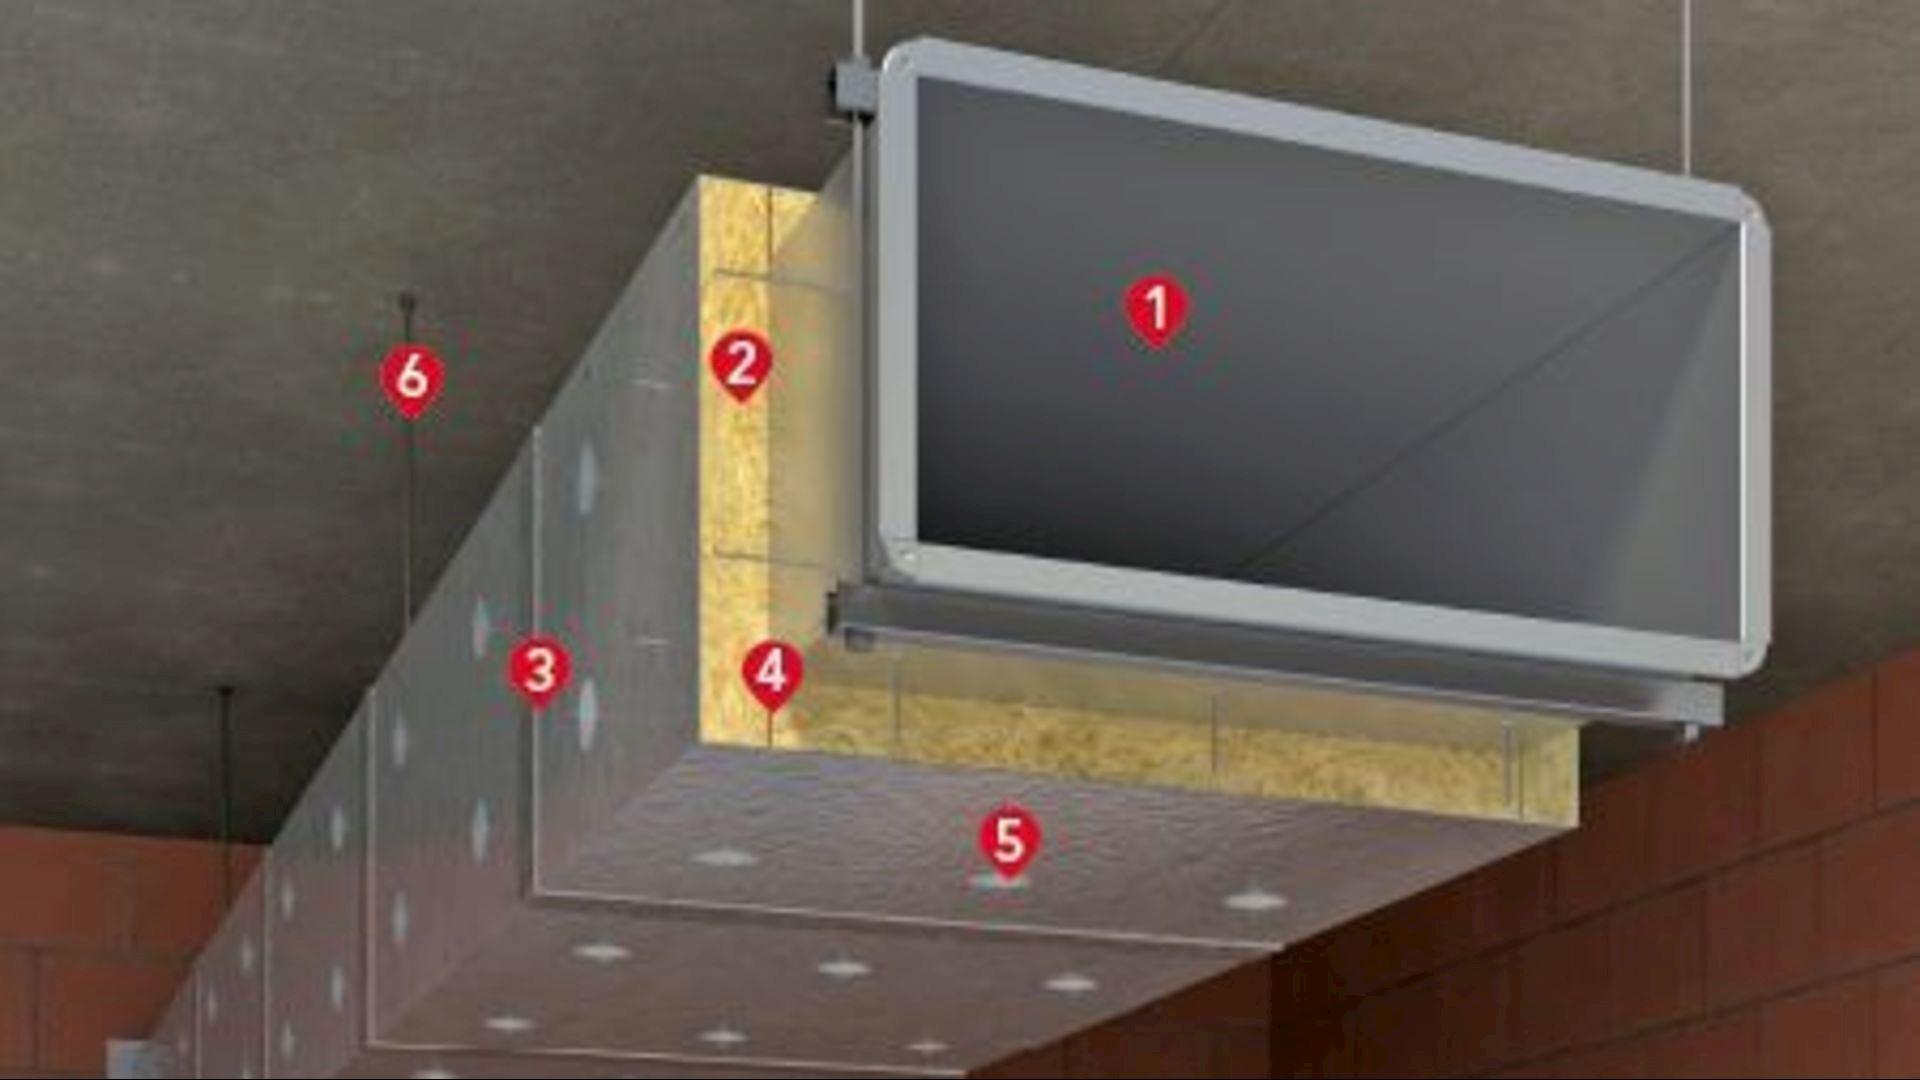 Product image, Conlit Ductrock mat, system